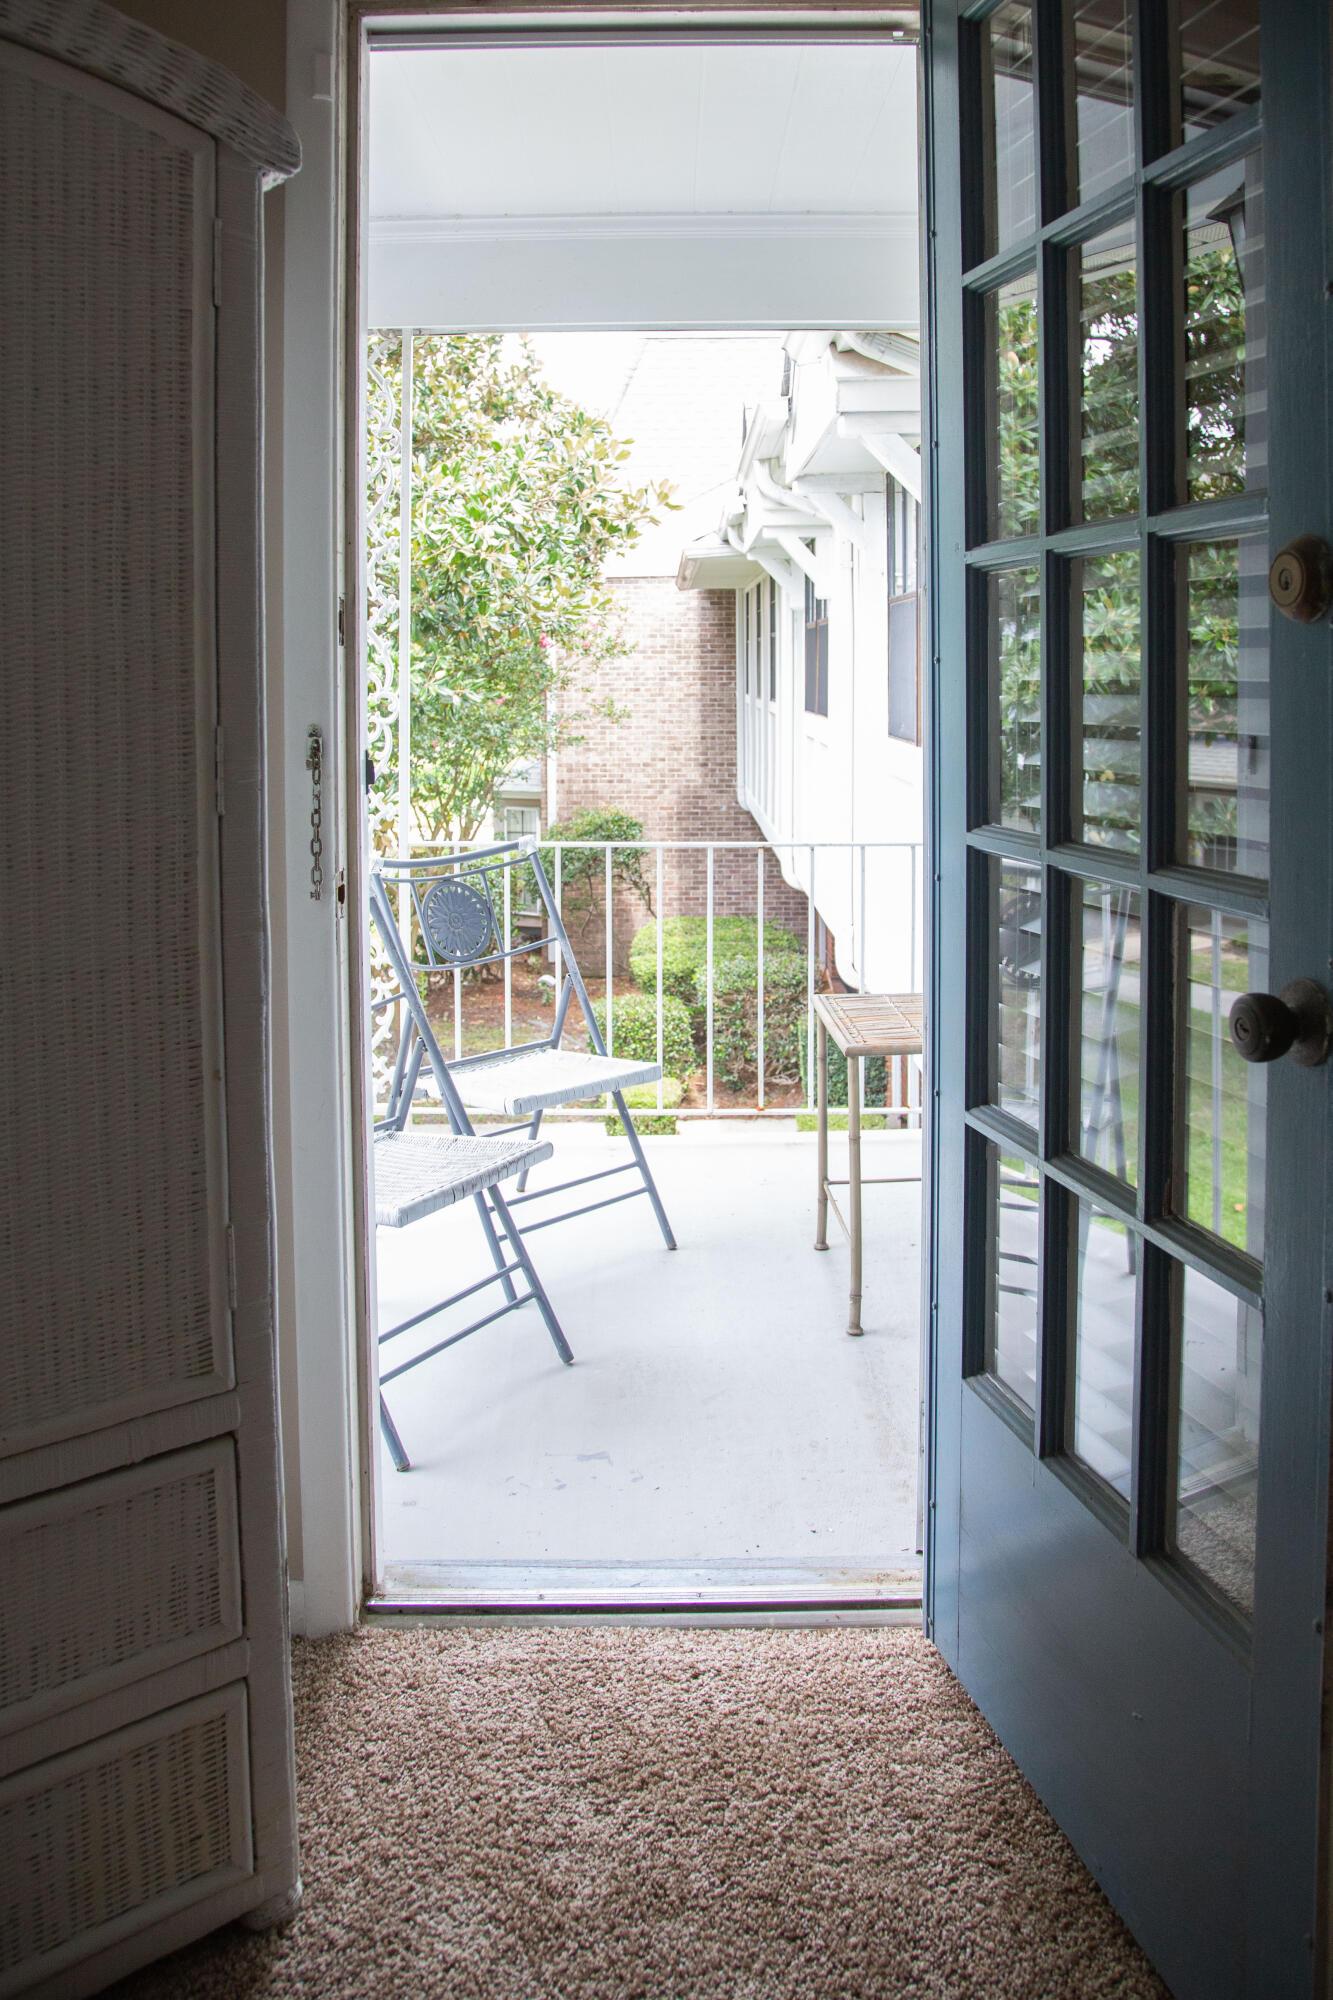 Old Towne Villas Homes For Sale - 2923 Barrington, Charleston, SC - 7